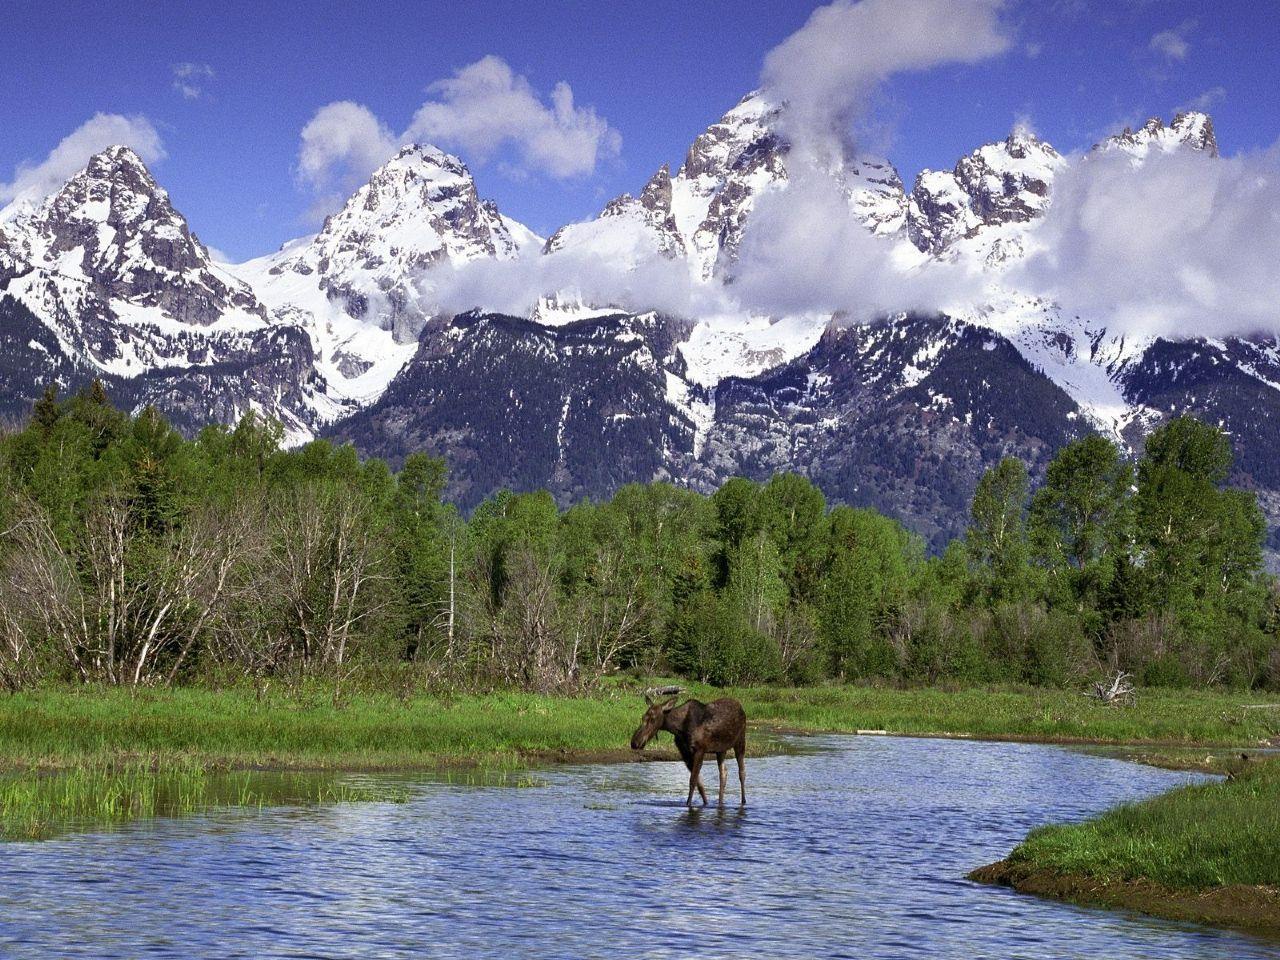 National Park clipart nature park National clipart Teton #4 Download